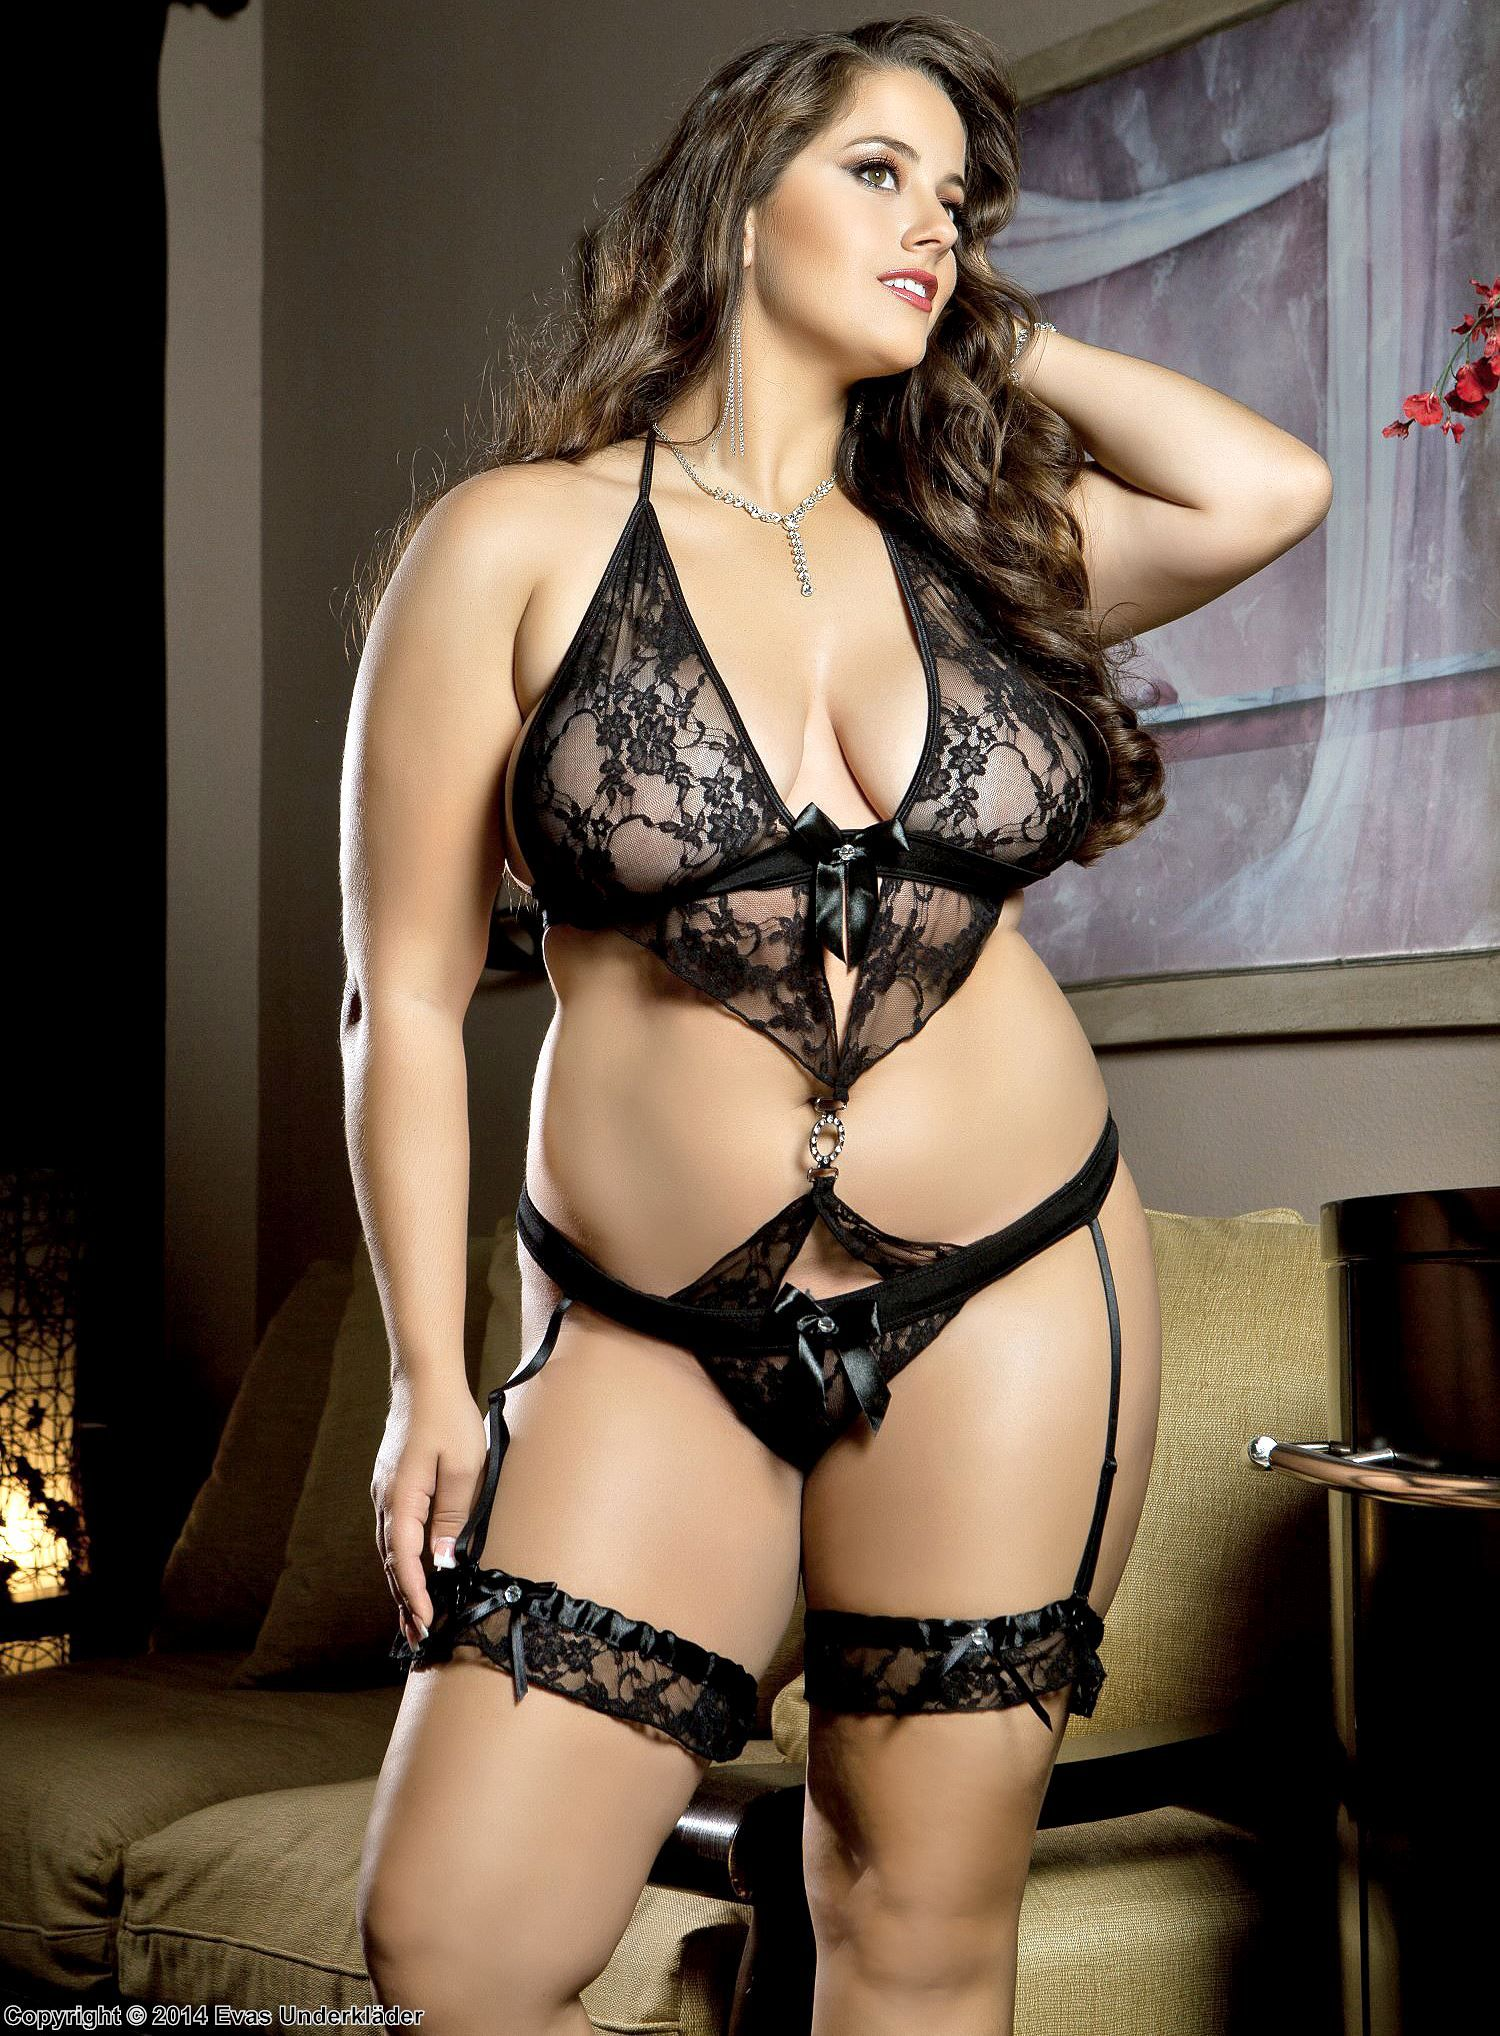 massage sexy lady snygga nakna bröst